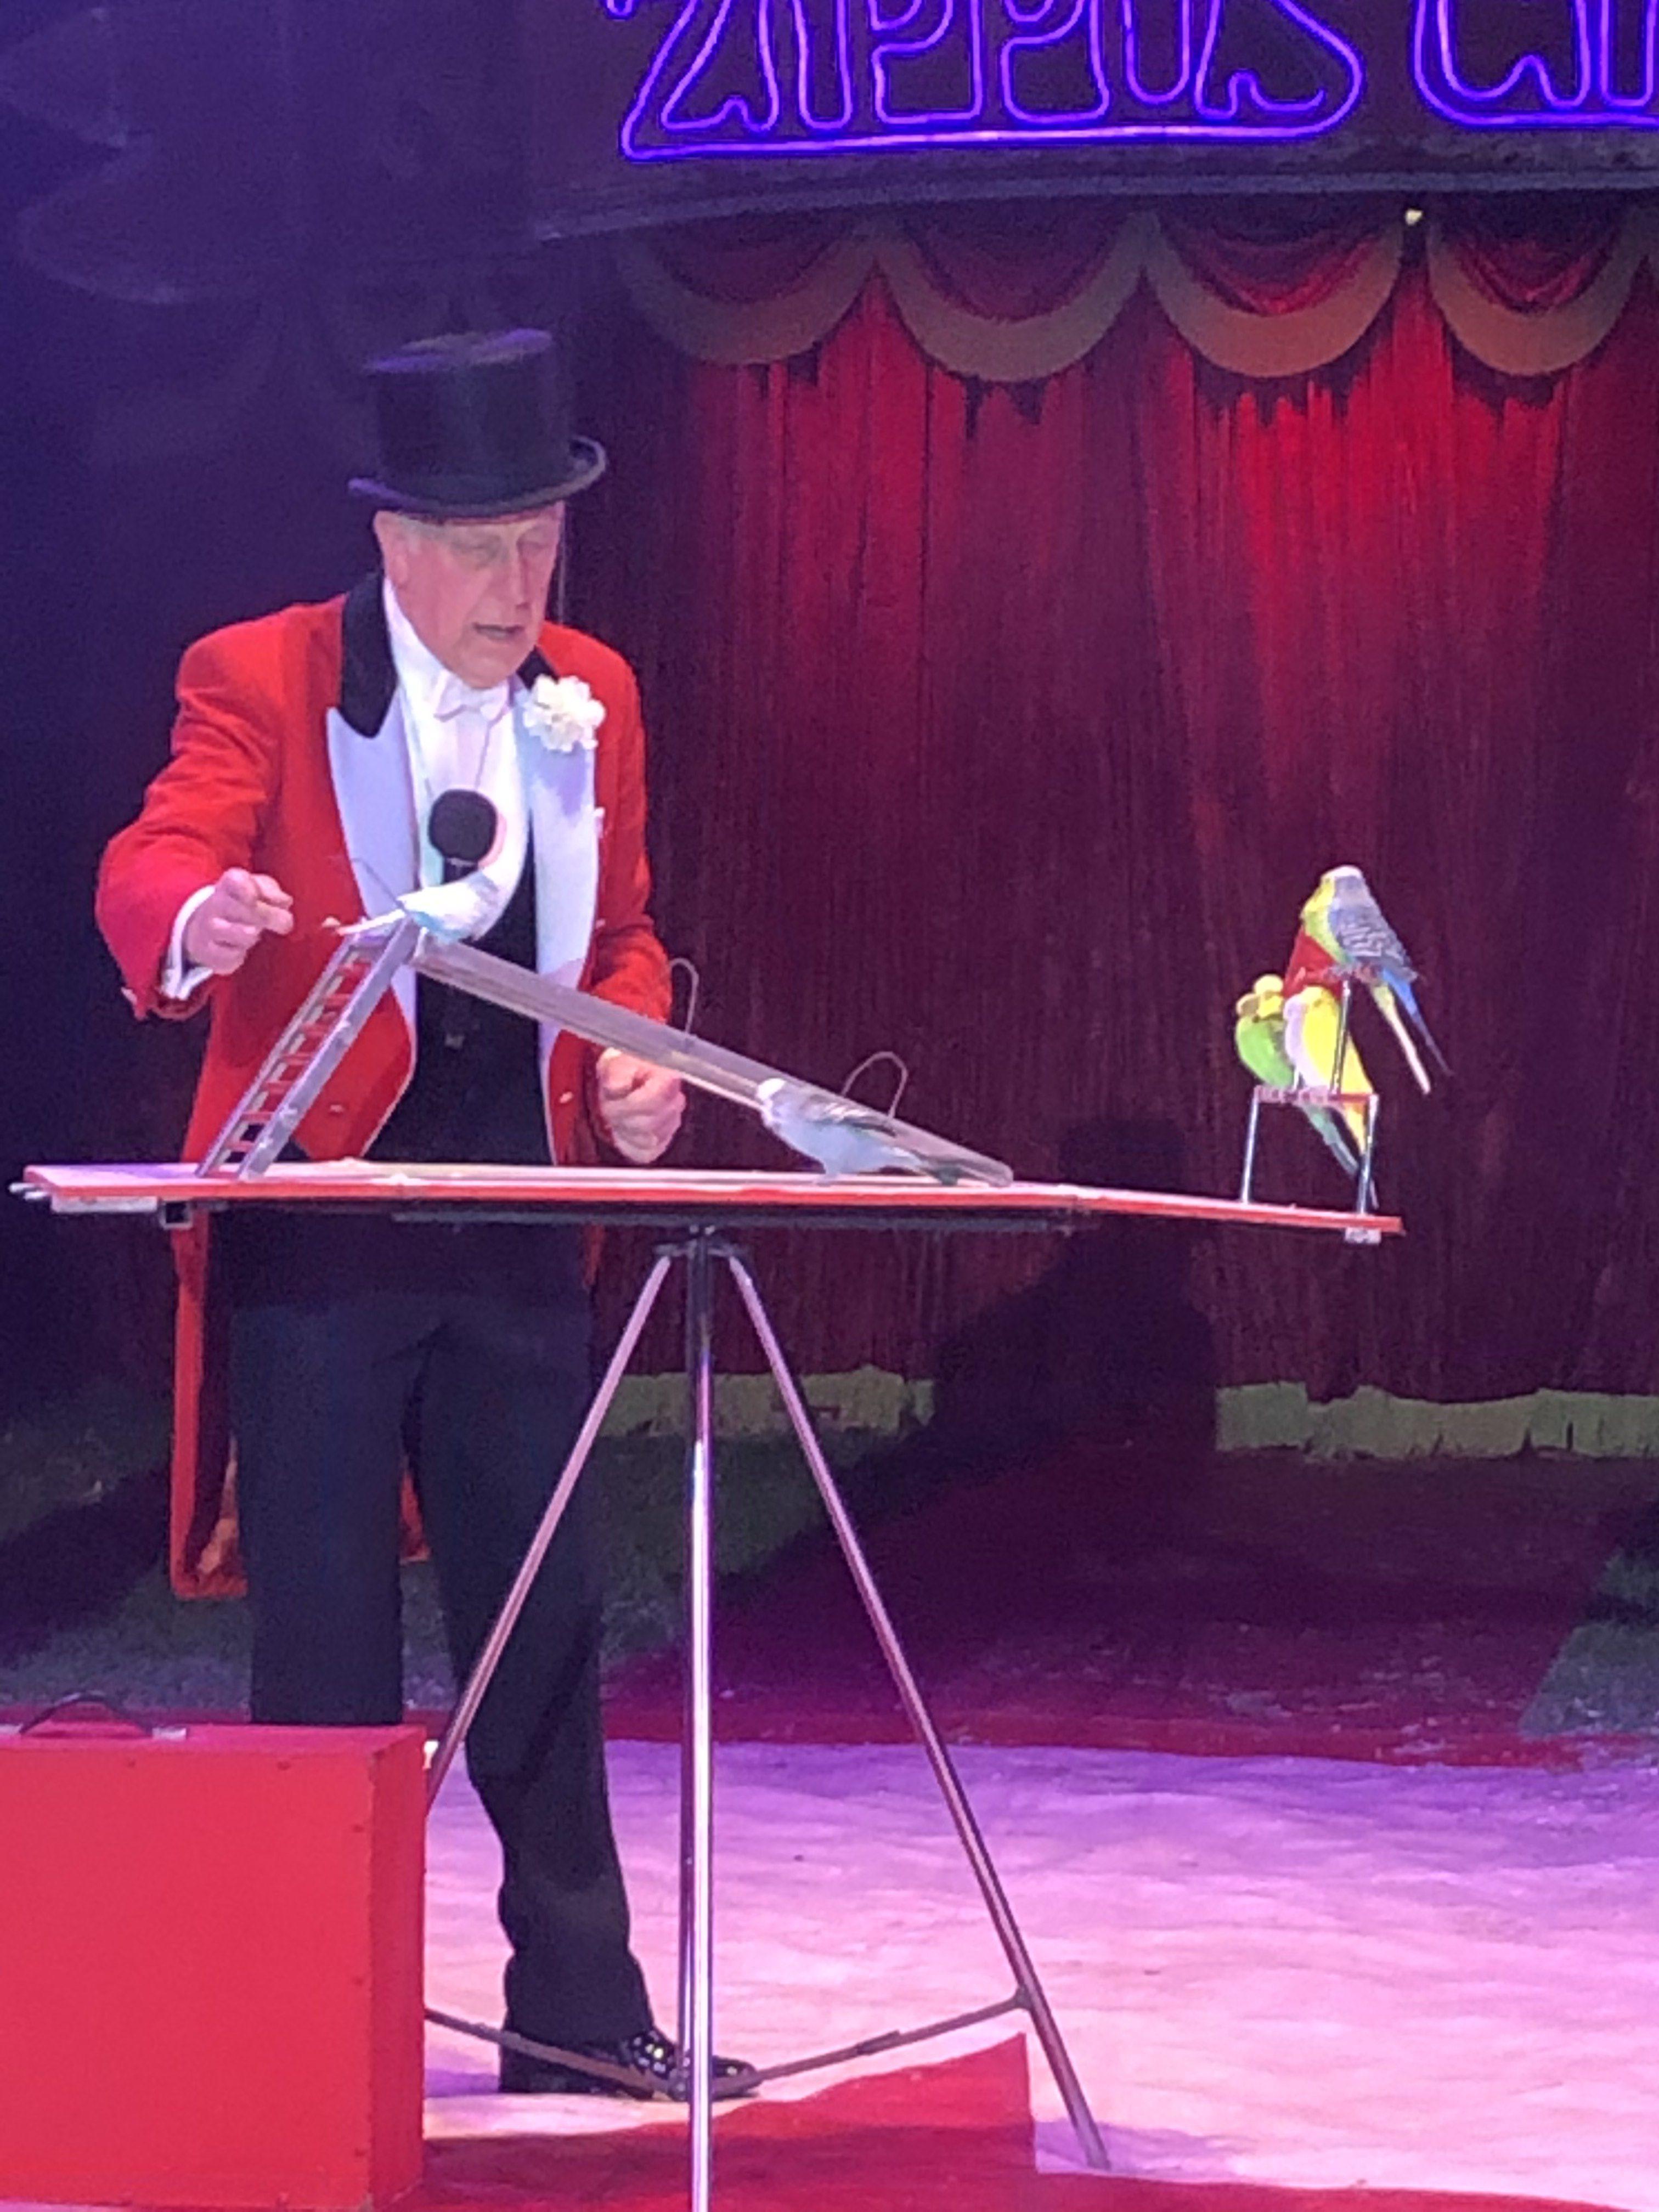 zippo's circus, performing budgies